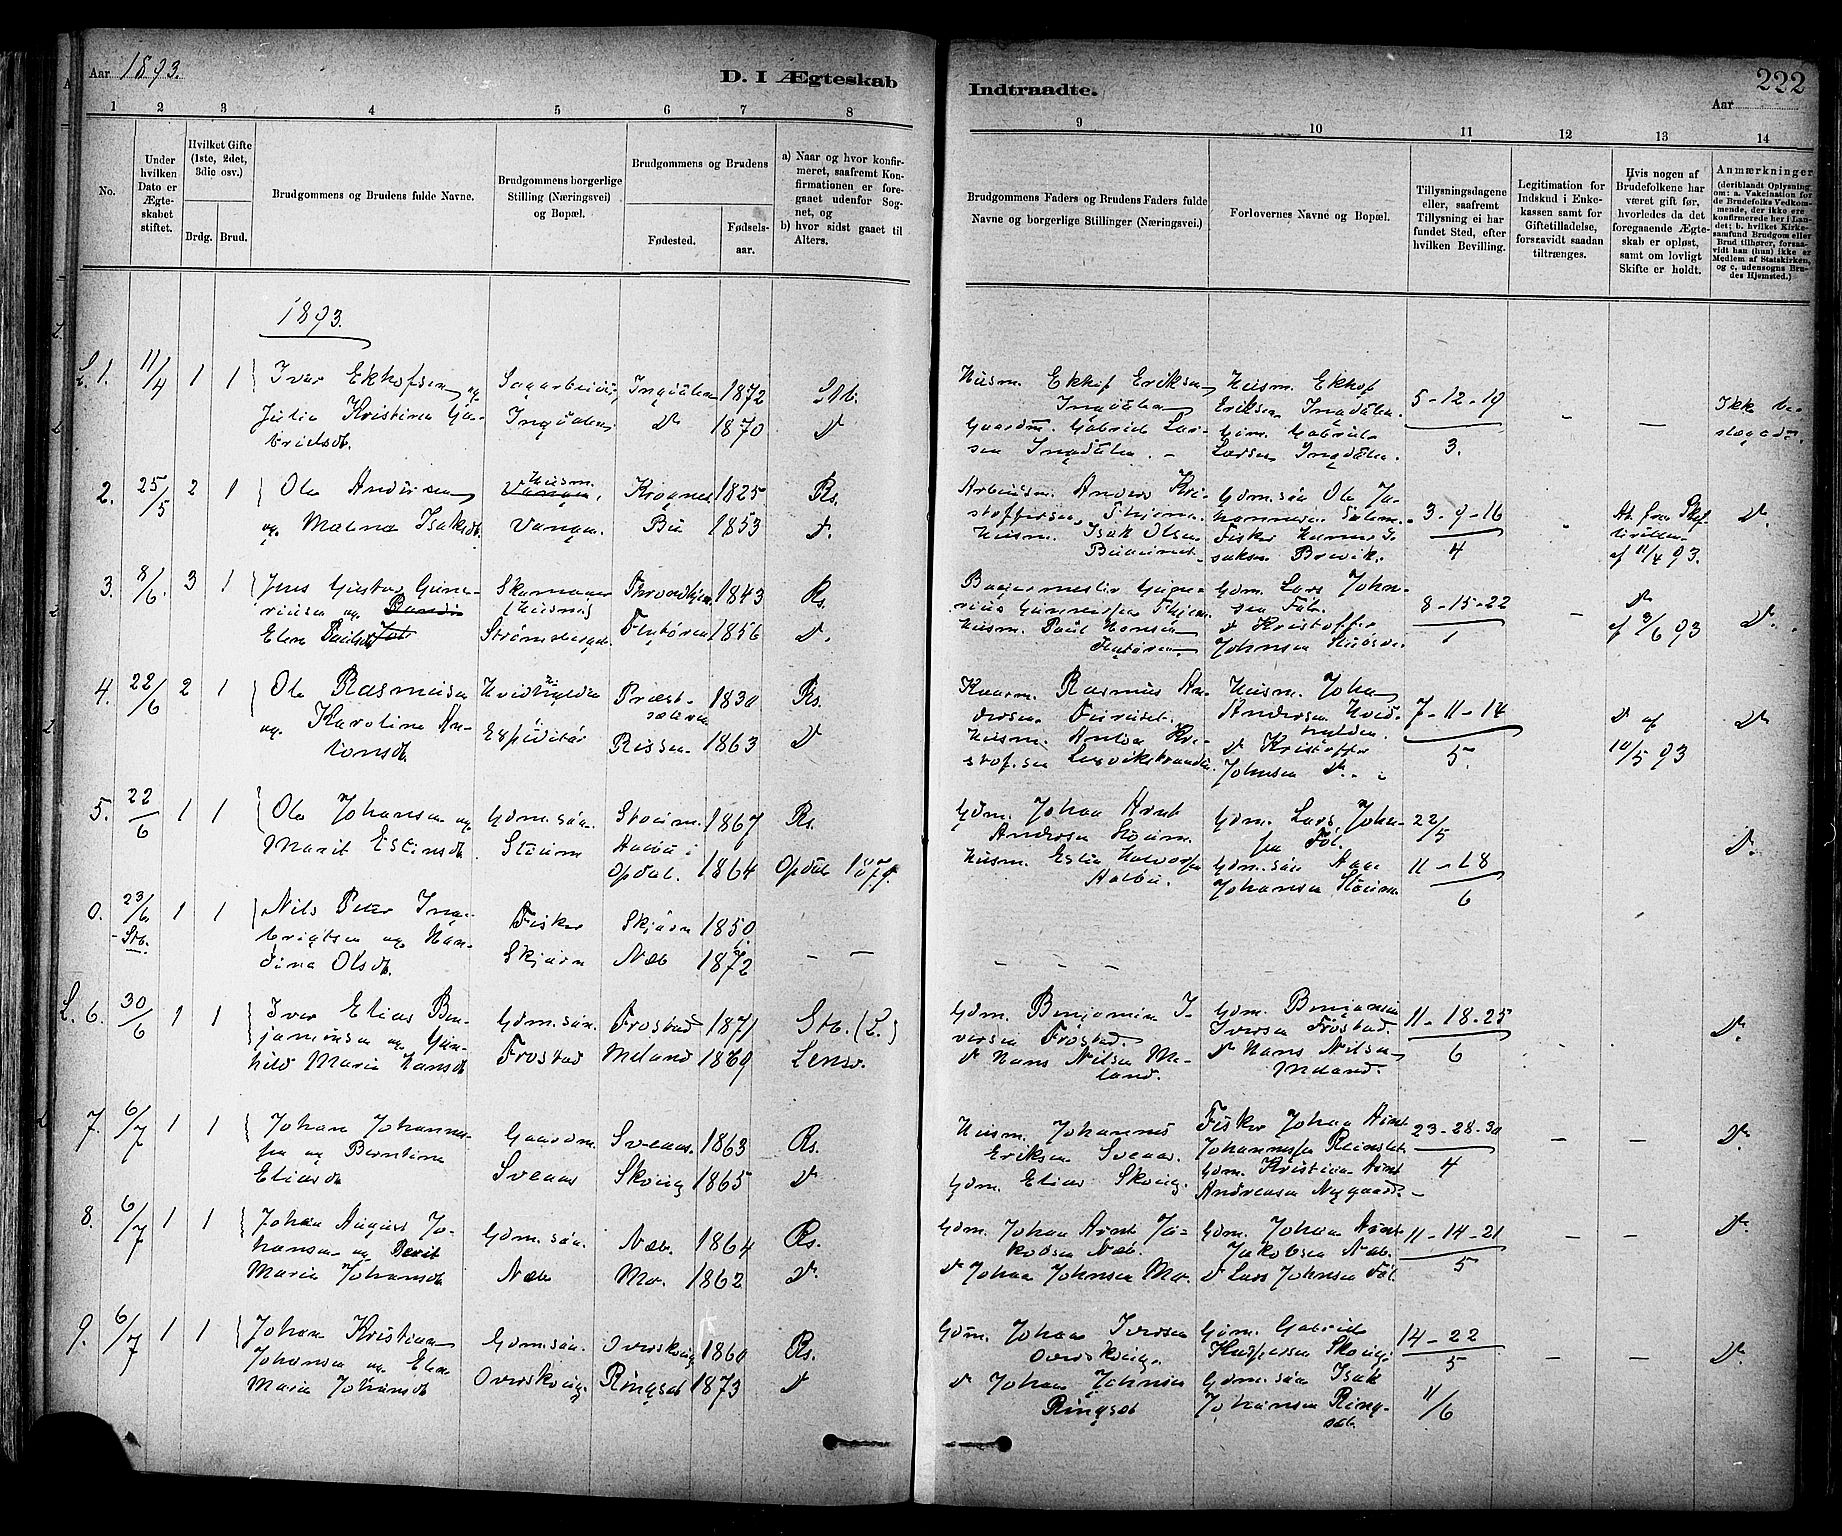 SAT, Ministerialprotokoller, klokkerbøker og fødselsregistre - Sør-Trøndelag, 647/L0634: Parish register (official) no. 647A01, 1885-1896, p. 222